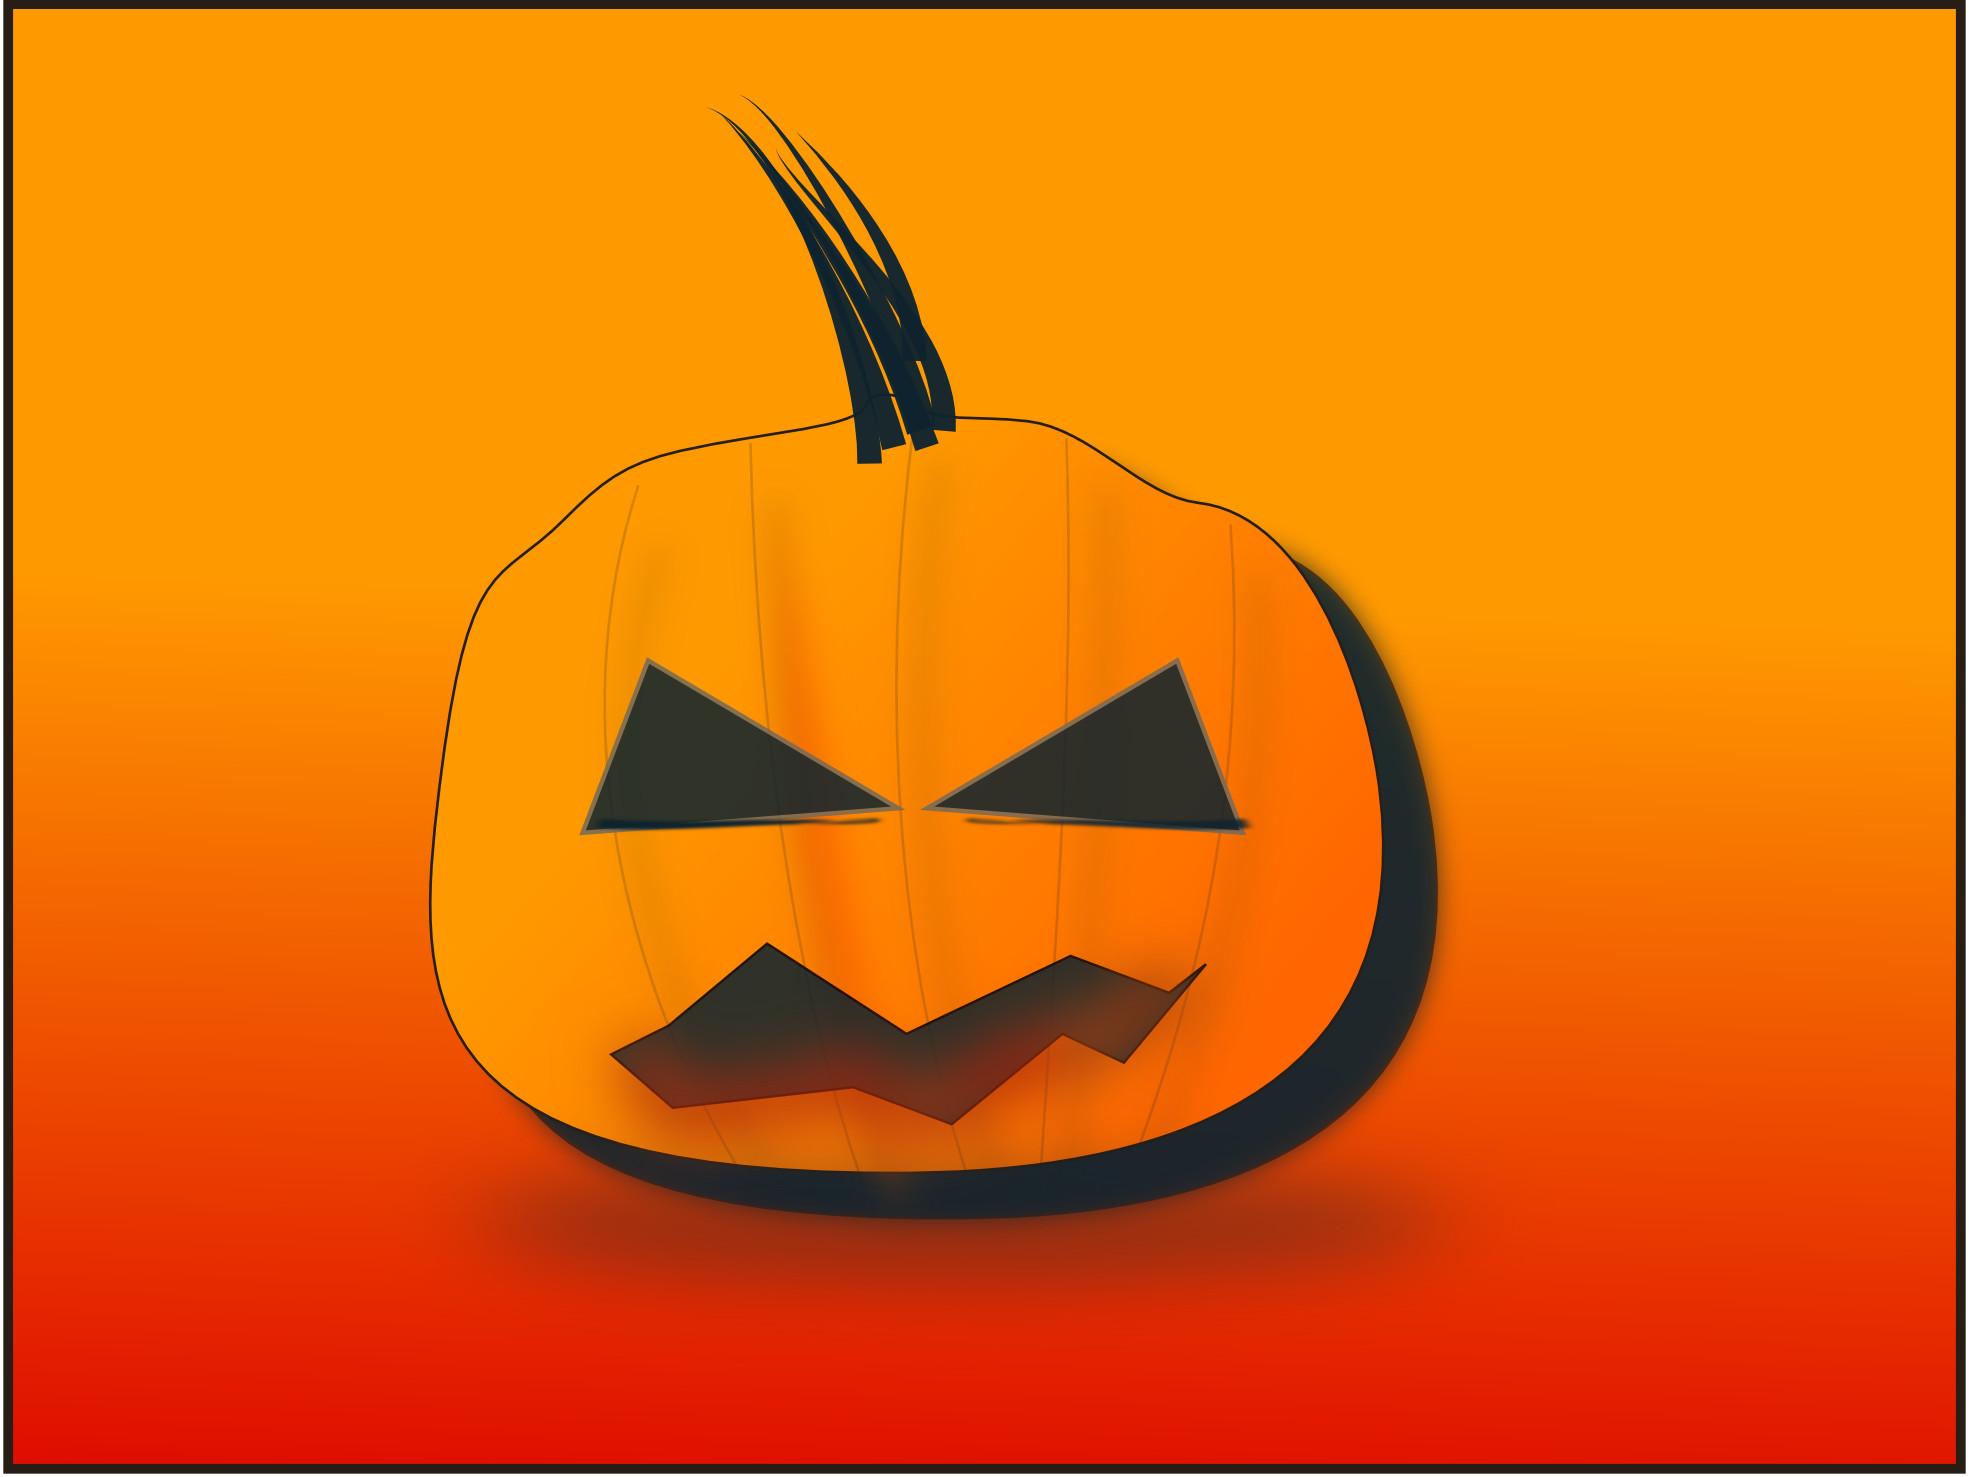 pumpkin pc backgrounds hd free